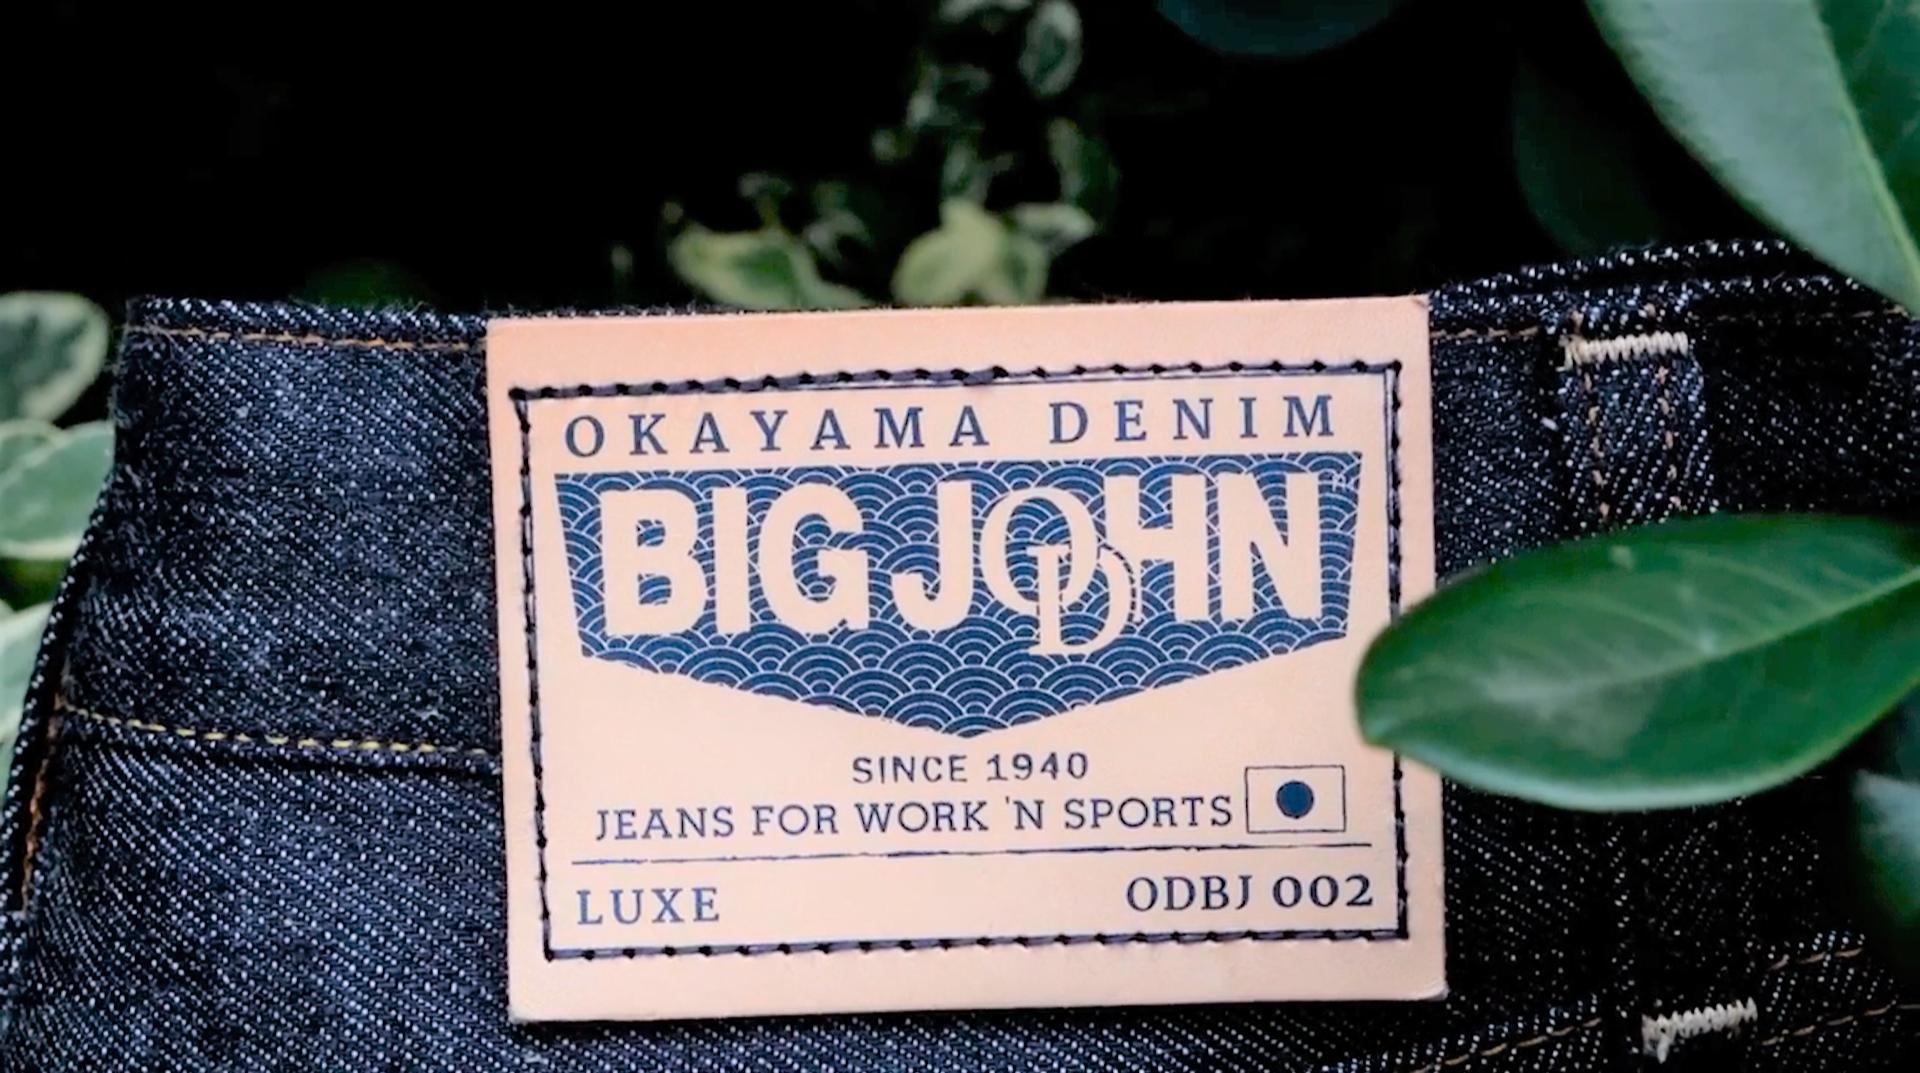 Buy original Selvedge denim jeans and jackets from Okayama Denim in Kobe, Japan